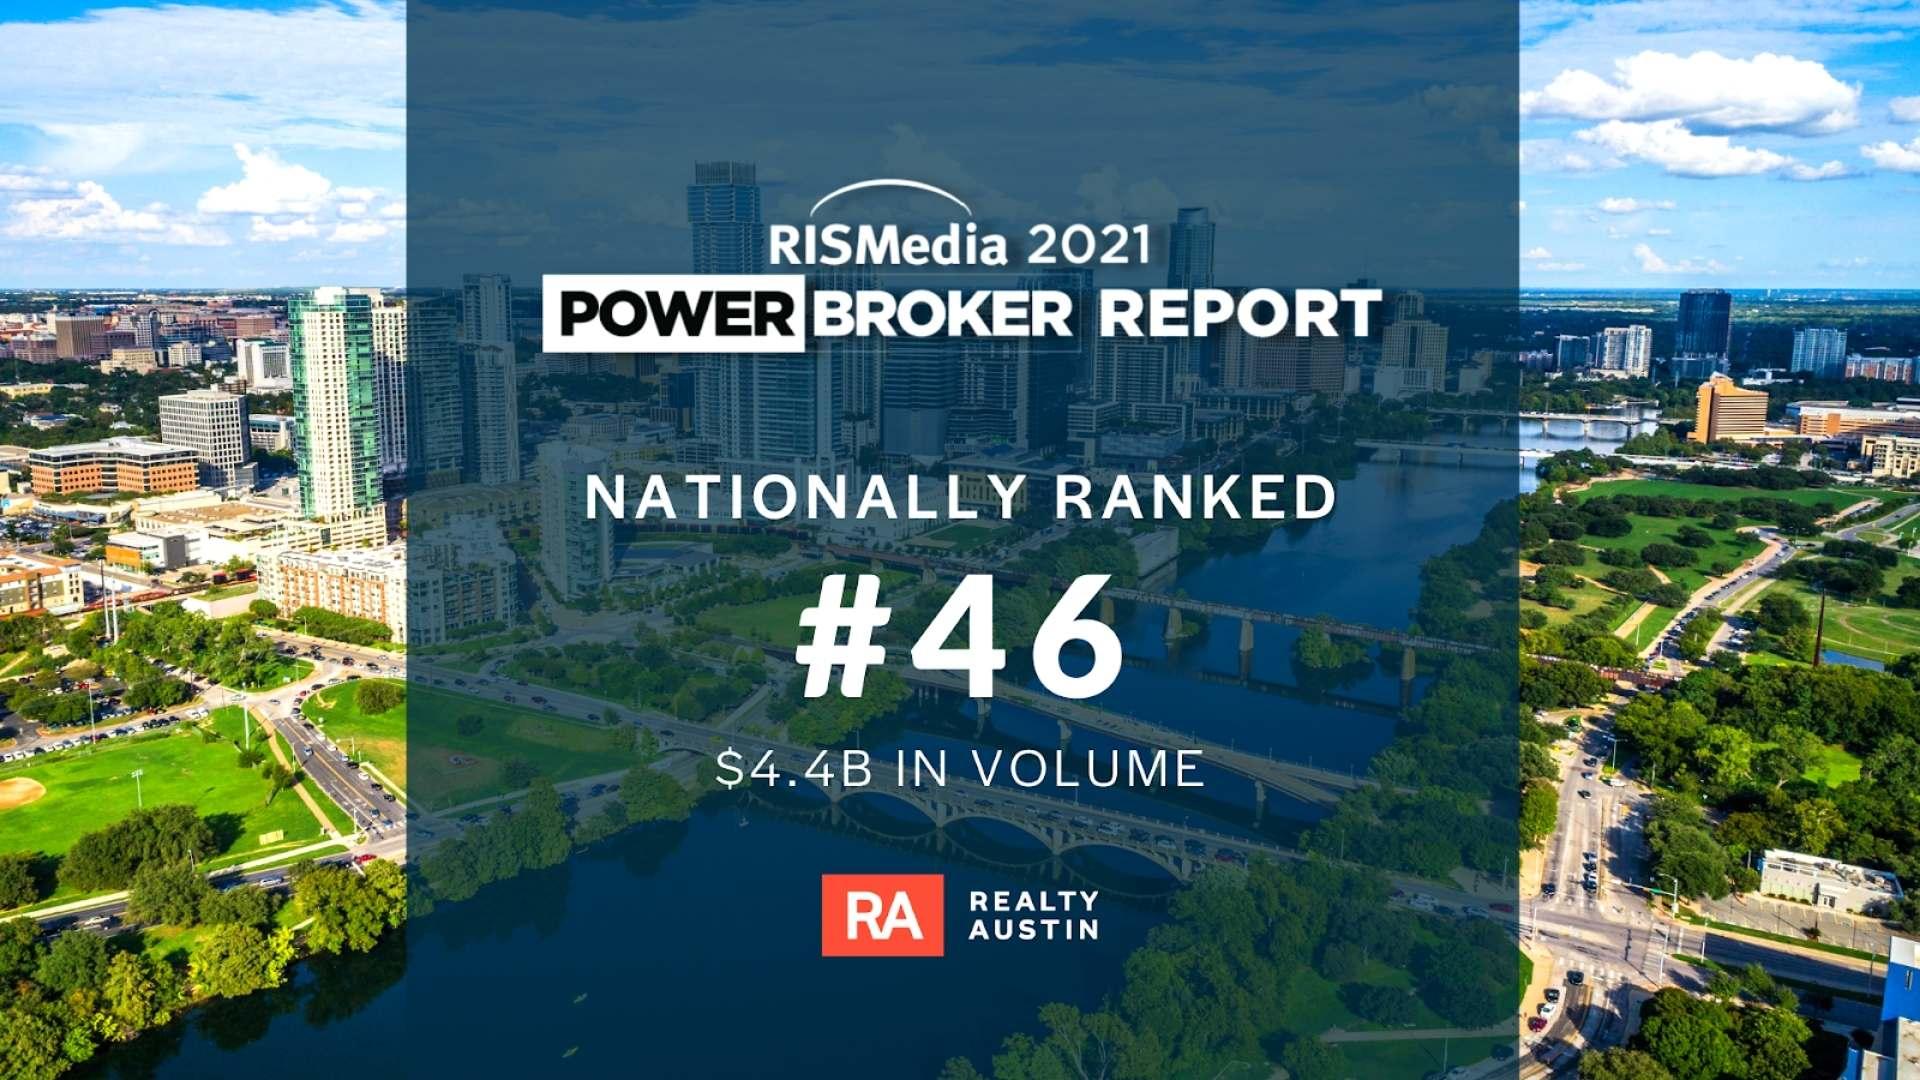 Realty Austin Ranks No. 46 in RISMedia 2021 Power Broker Report